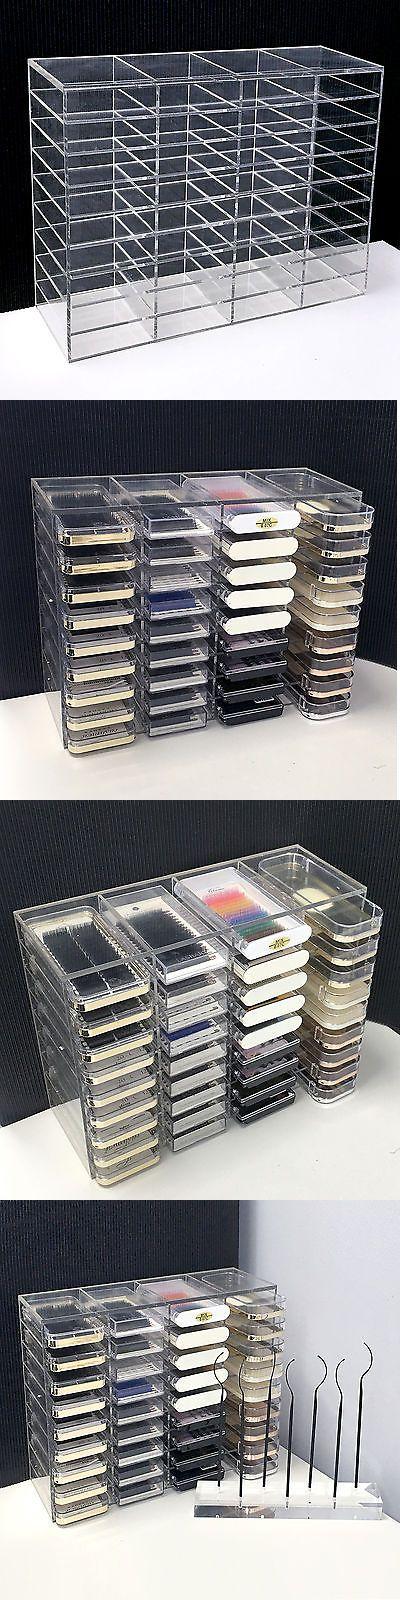 Eyelash Tools: Lashart Clear Acrylic Eyelash Extensions Display Stand Storage Shelf Holder -> BUY IT NOW ONLY: $42.6 on eBay!